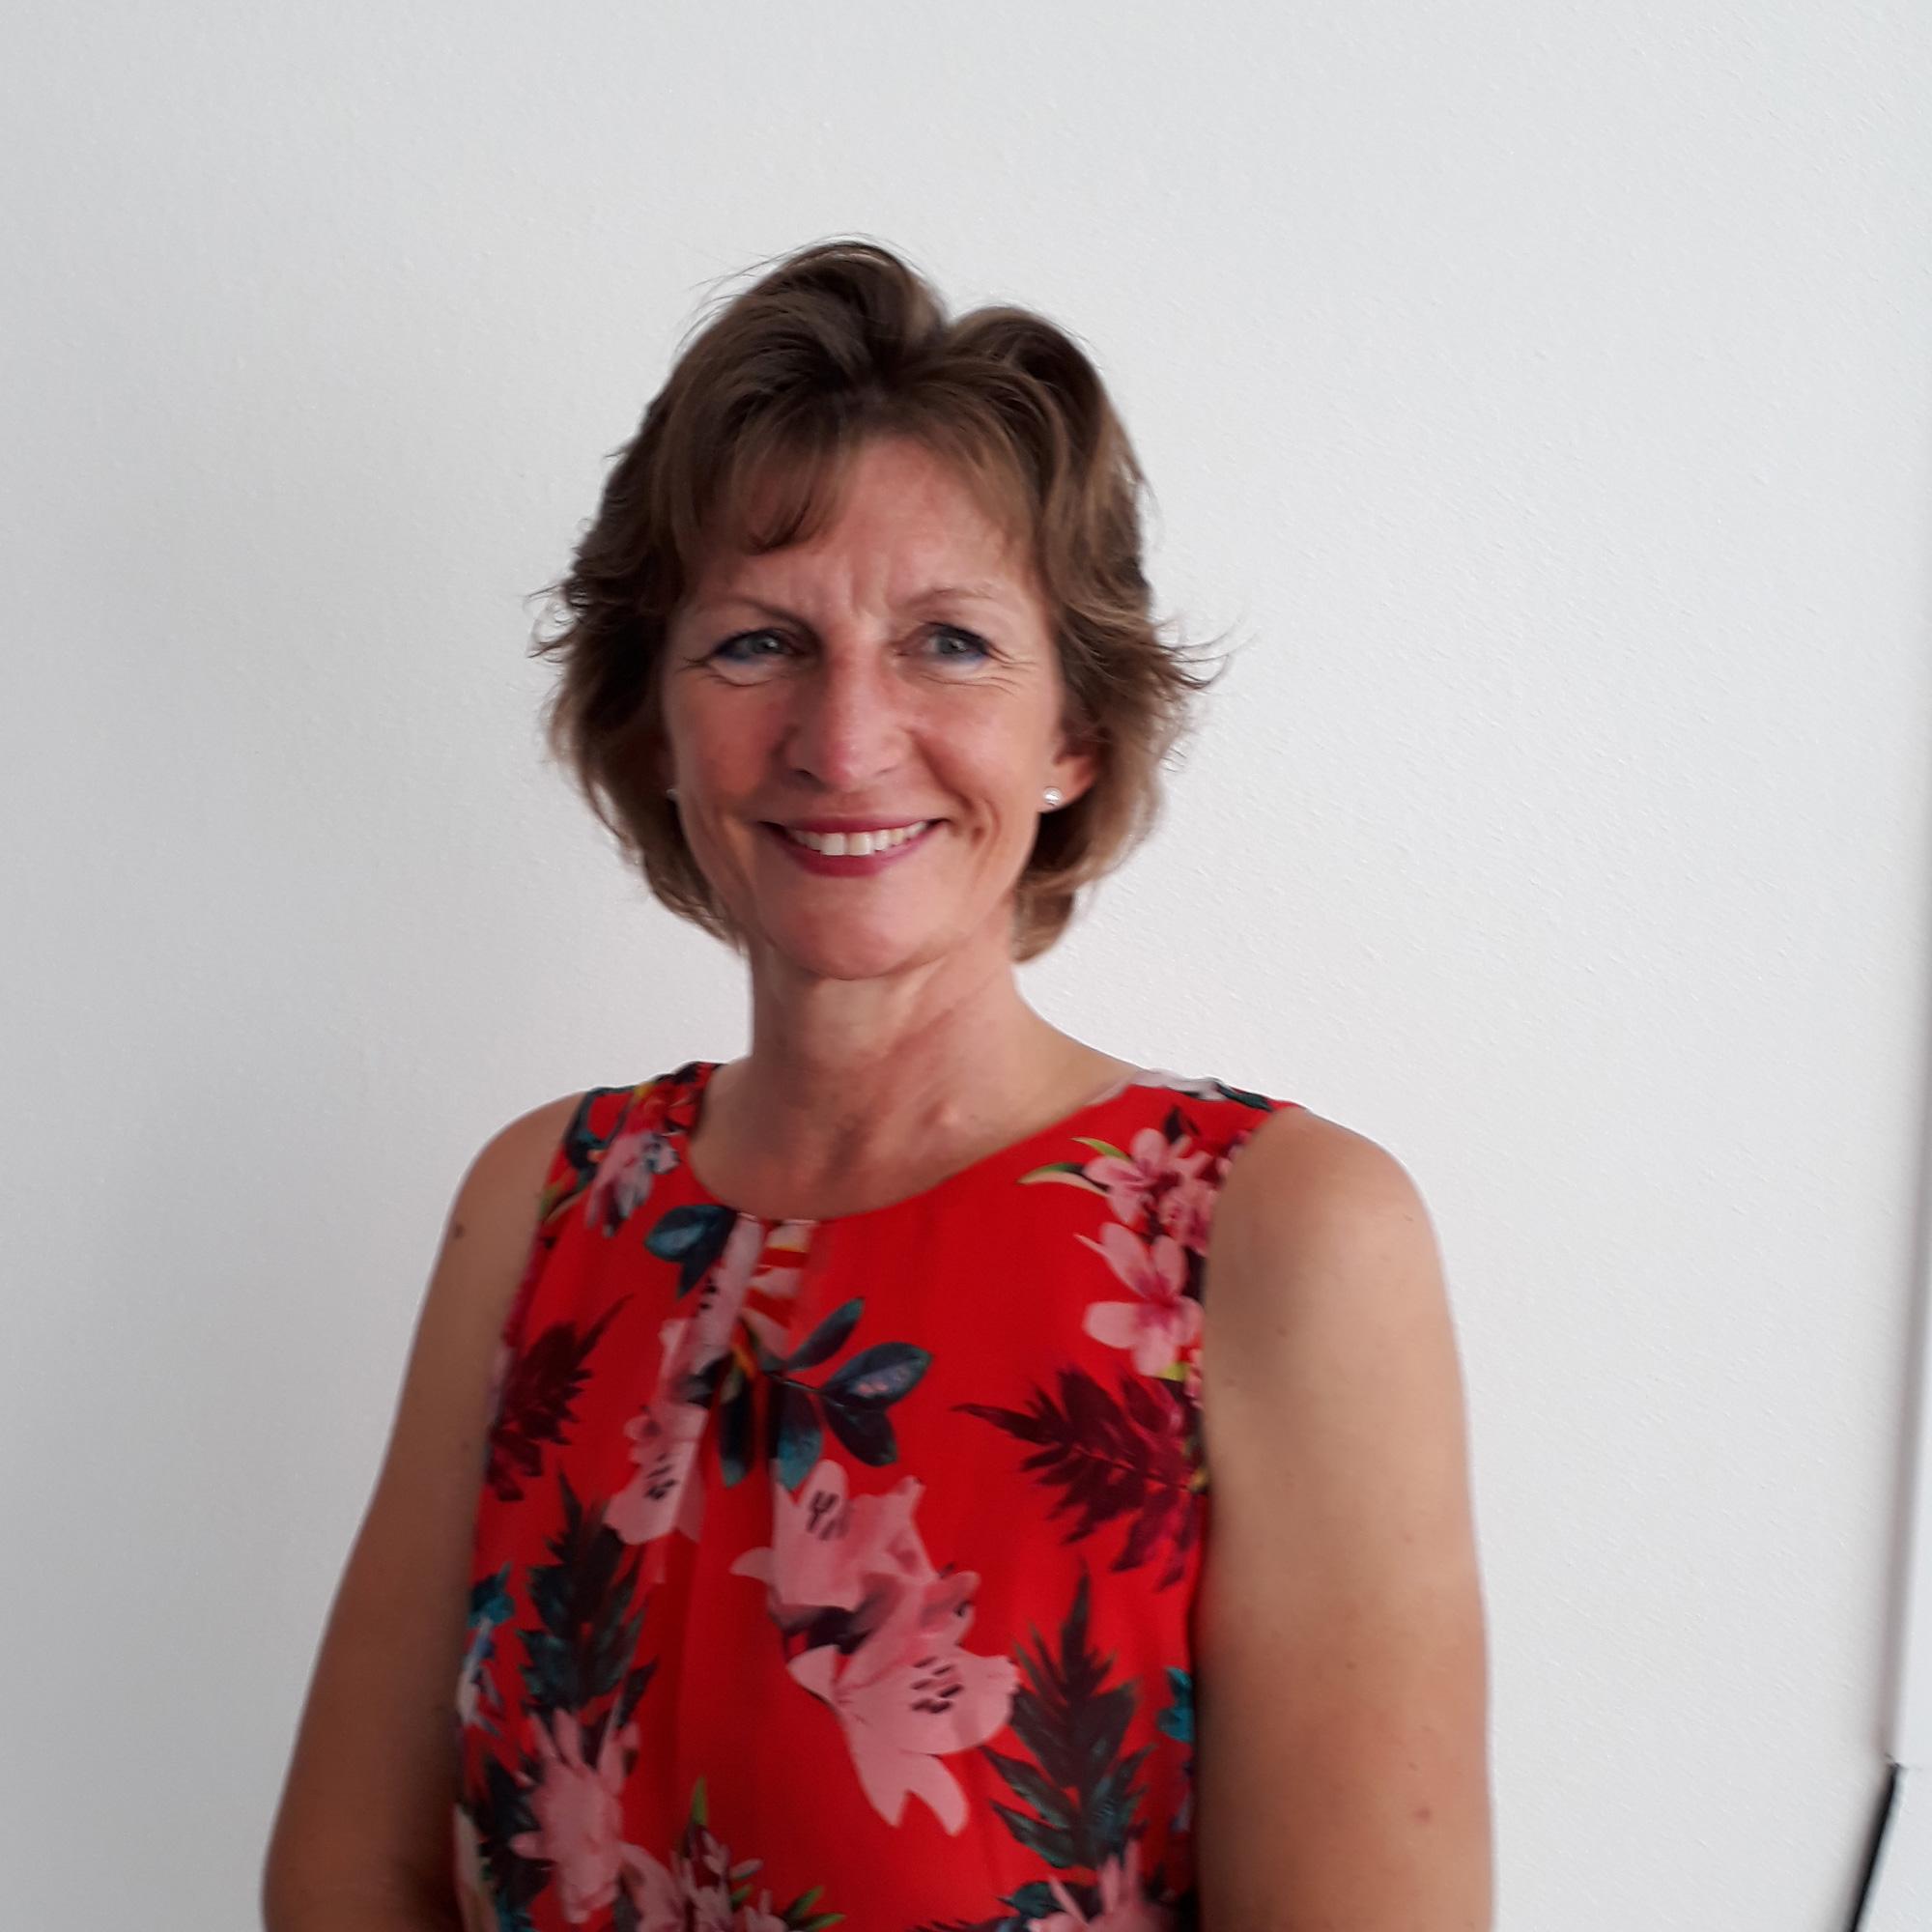 Katja Prohl